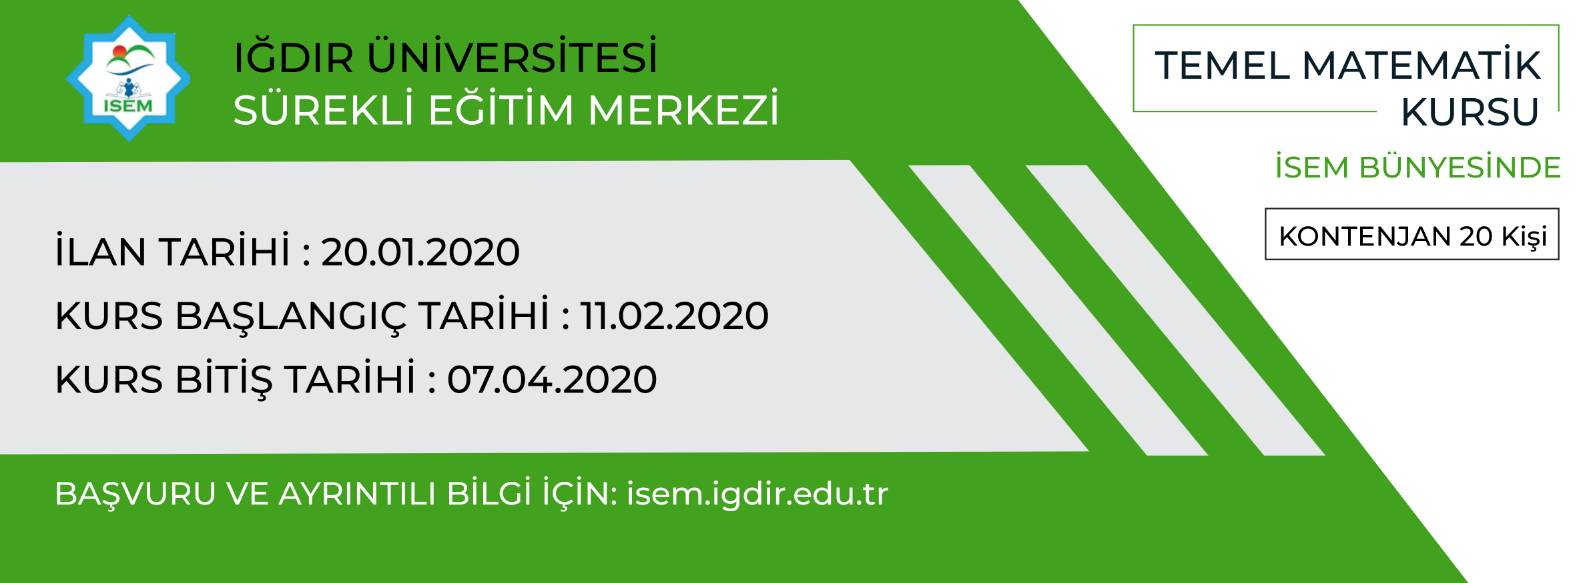 29-01-2020-temel-matematik-kursu-banner-1-h.jpg